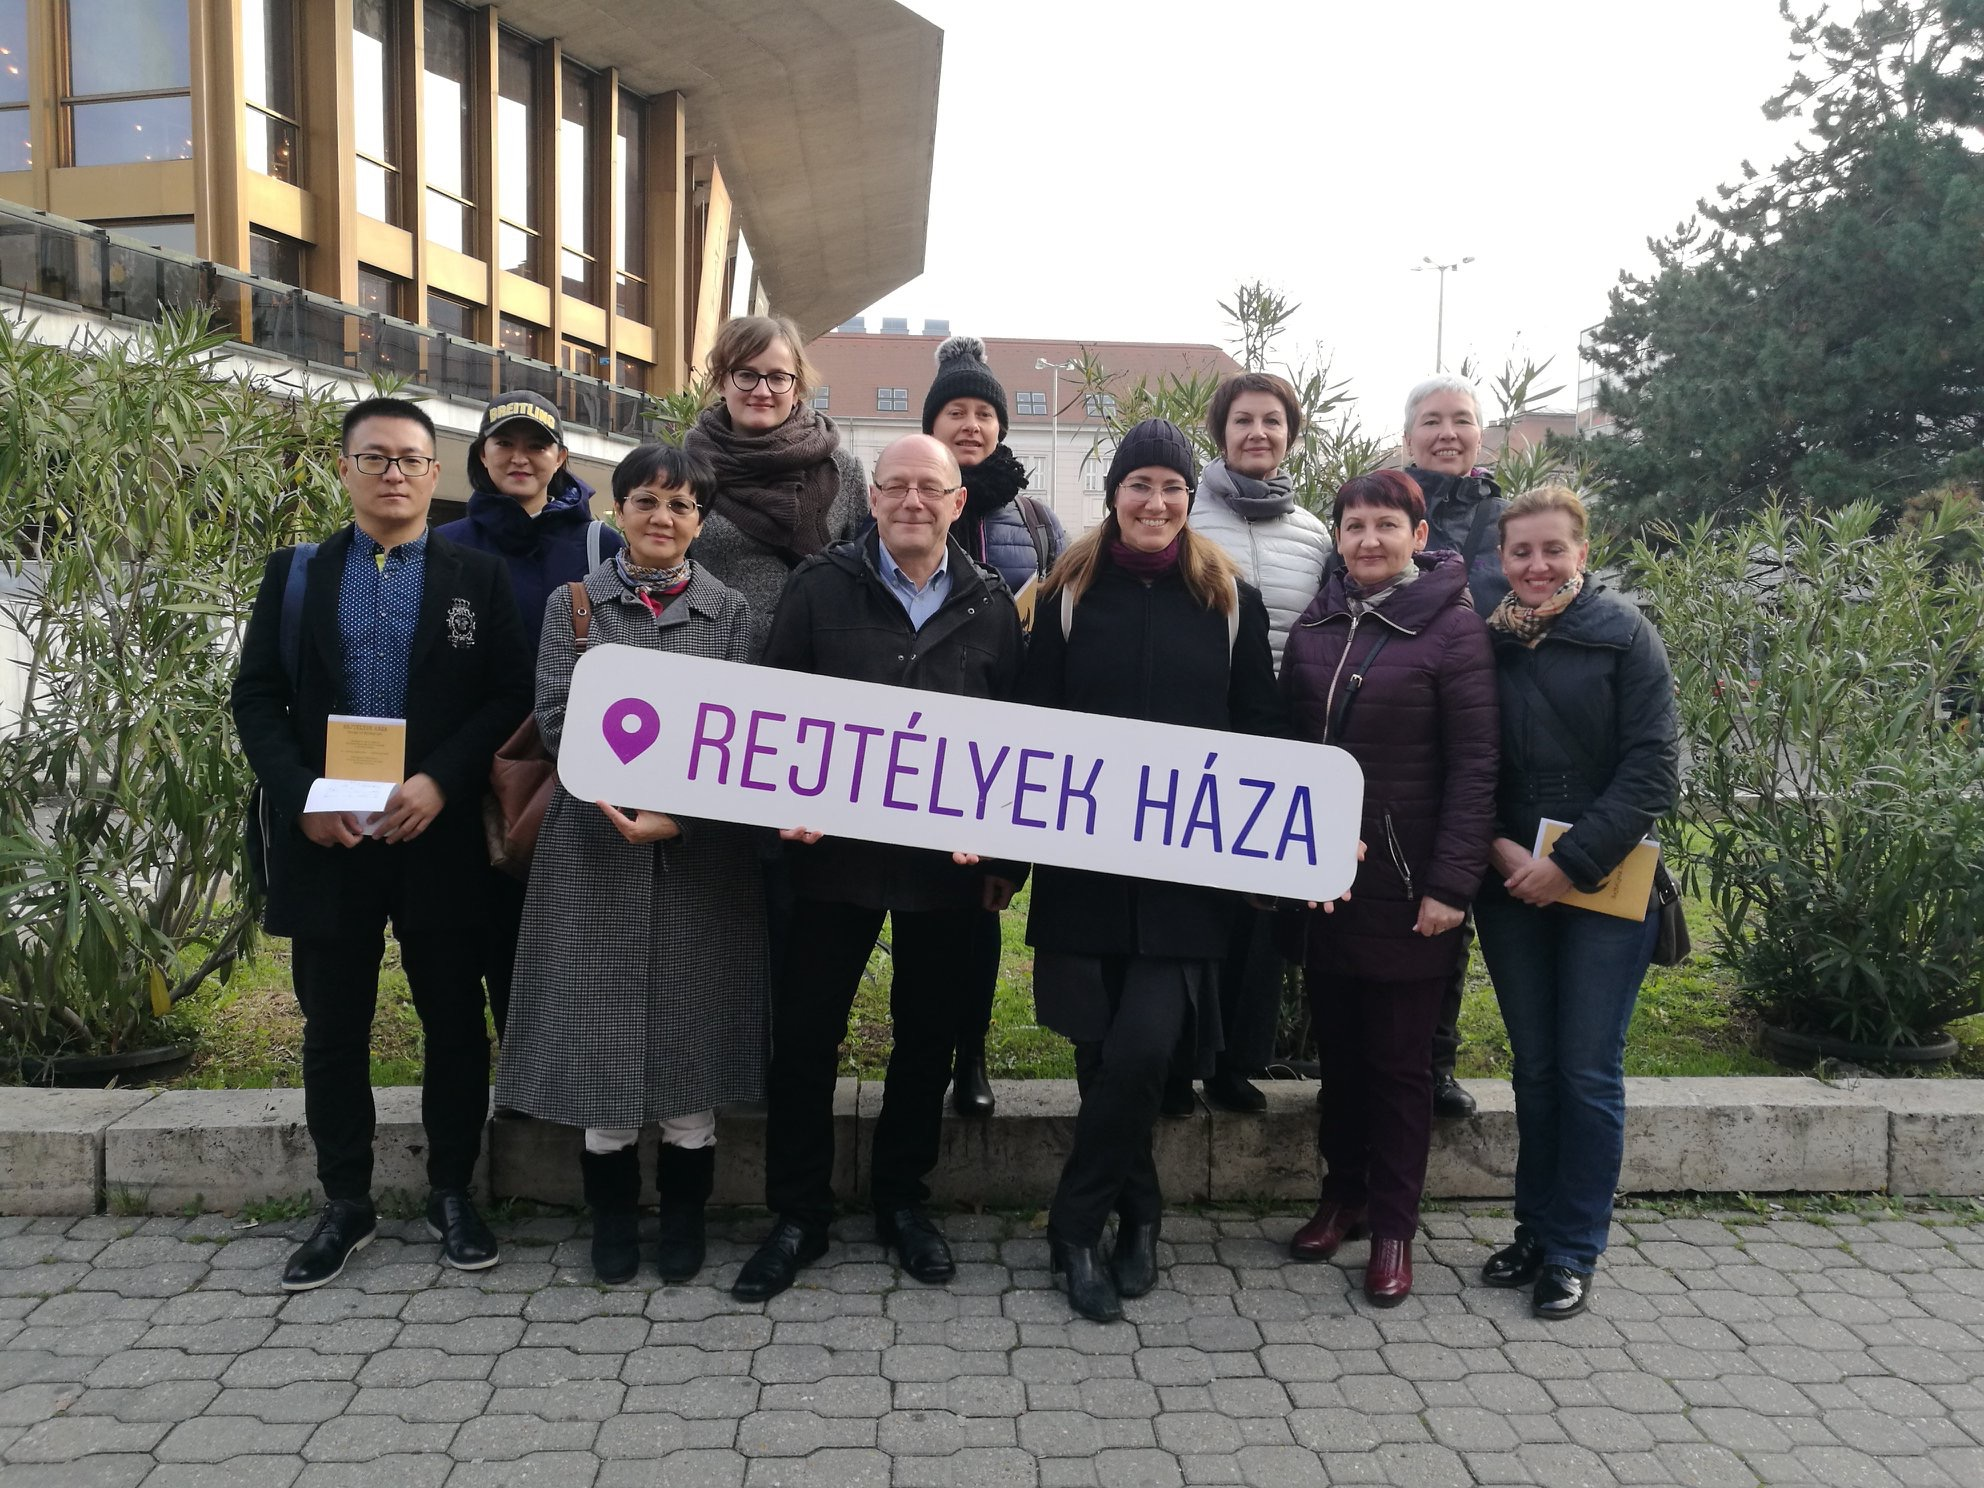 House of Mysteries / Stadtentdeckungsspiel